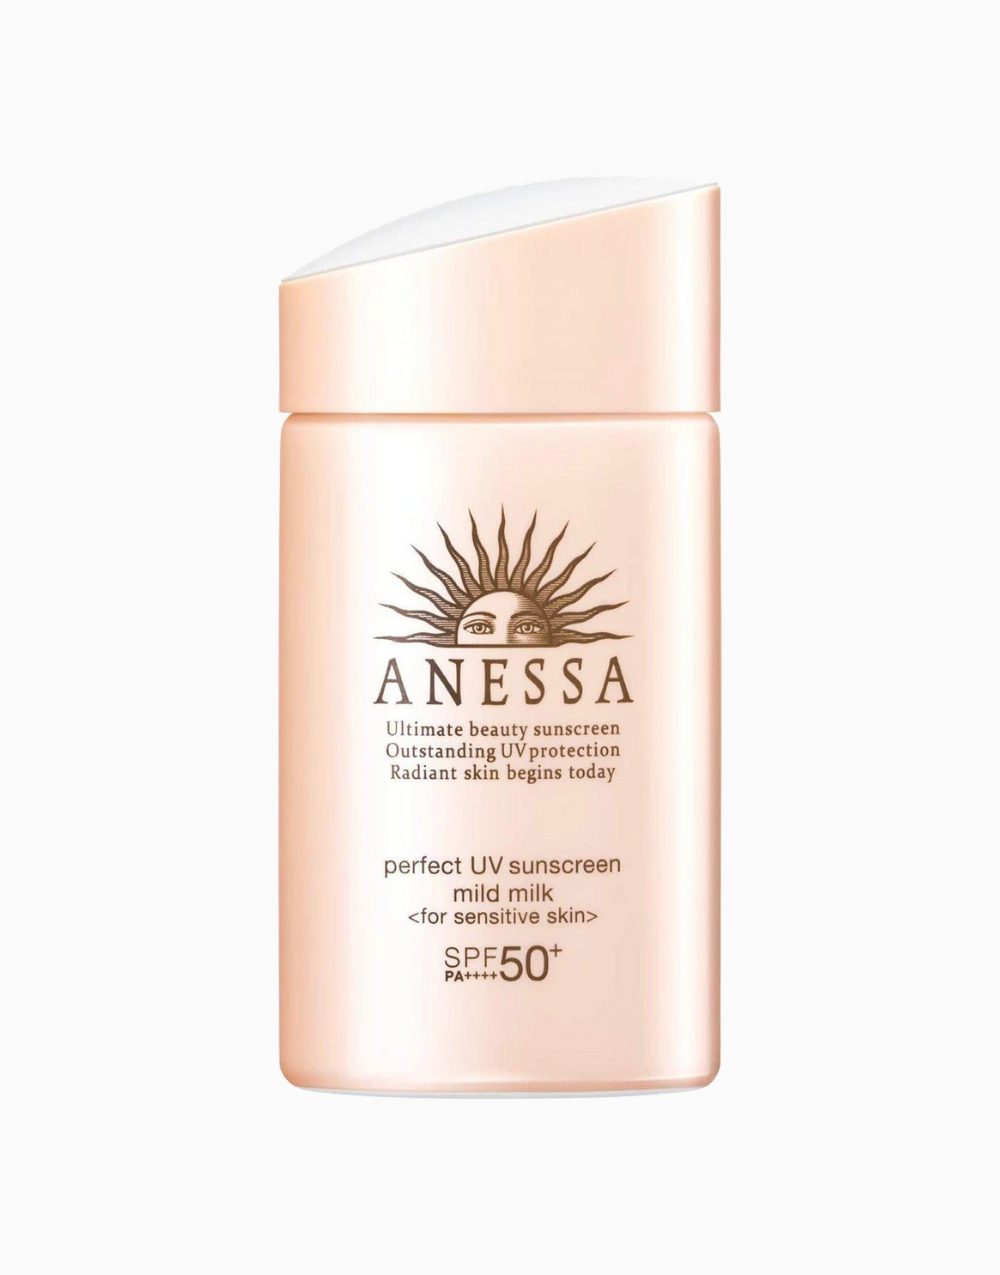 Perfect UV Sunscreen Mild Milk for Sensitive Skin SPF 50+ PA++++ (60ml) by Anessa